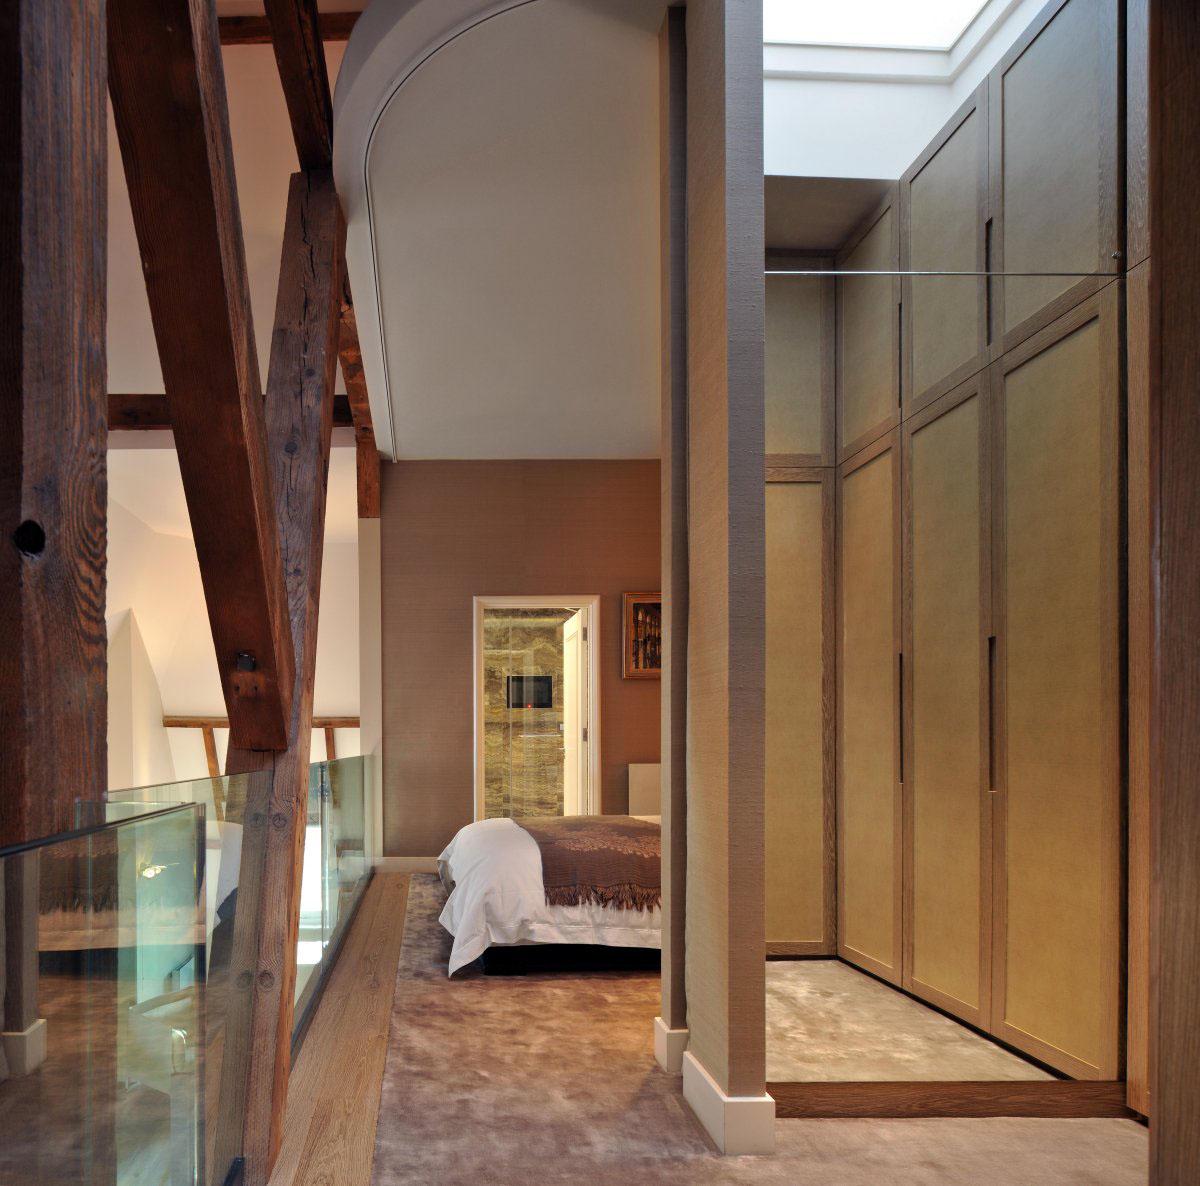 The Debonair Penthouse By A London Interior Designer: Contemporary London Penthouse Apartment In A Grade I